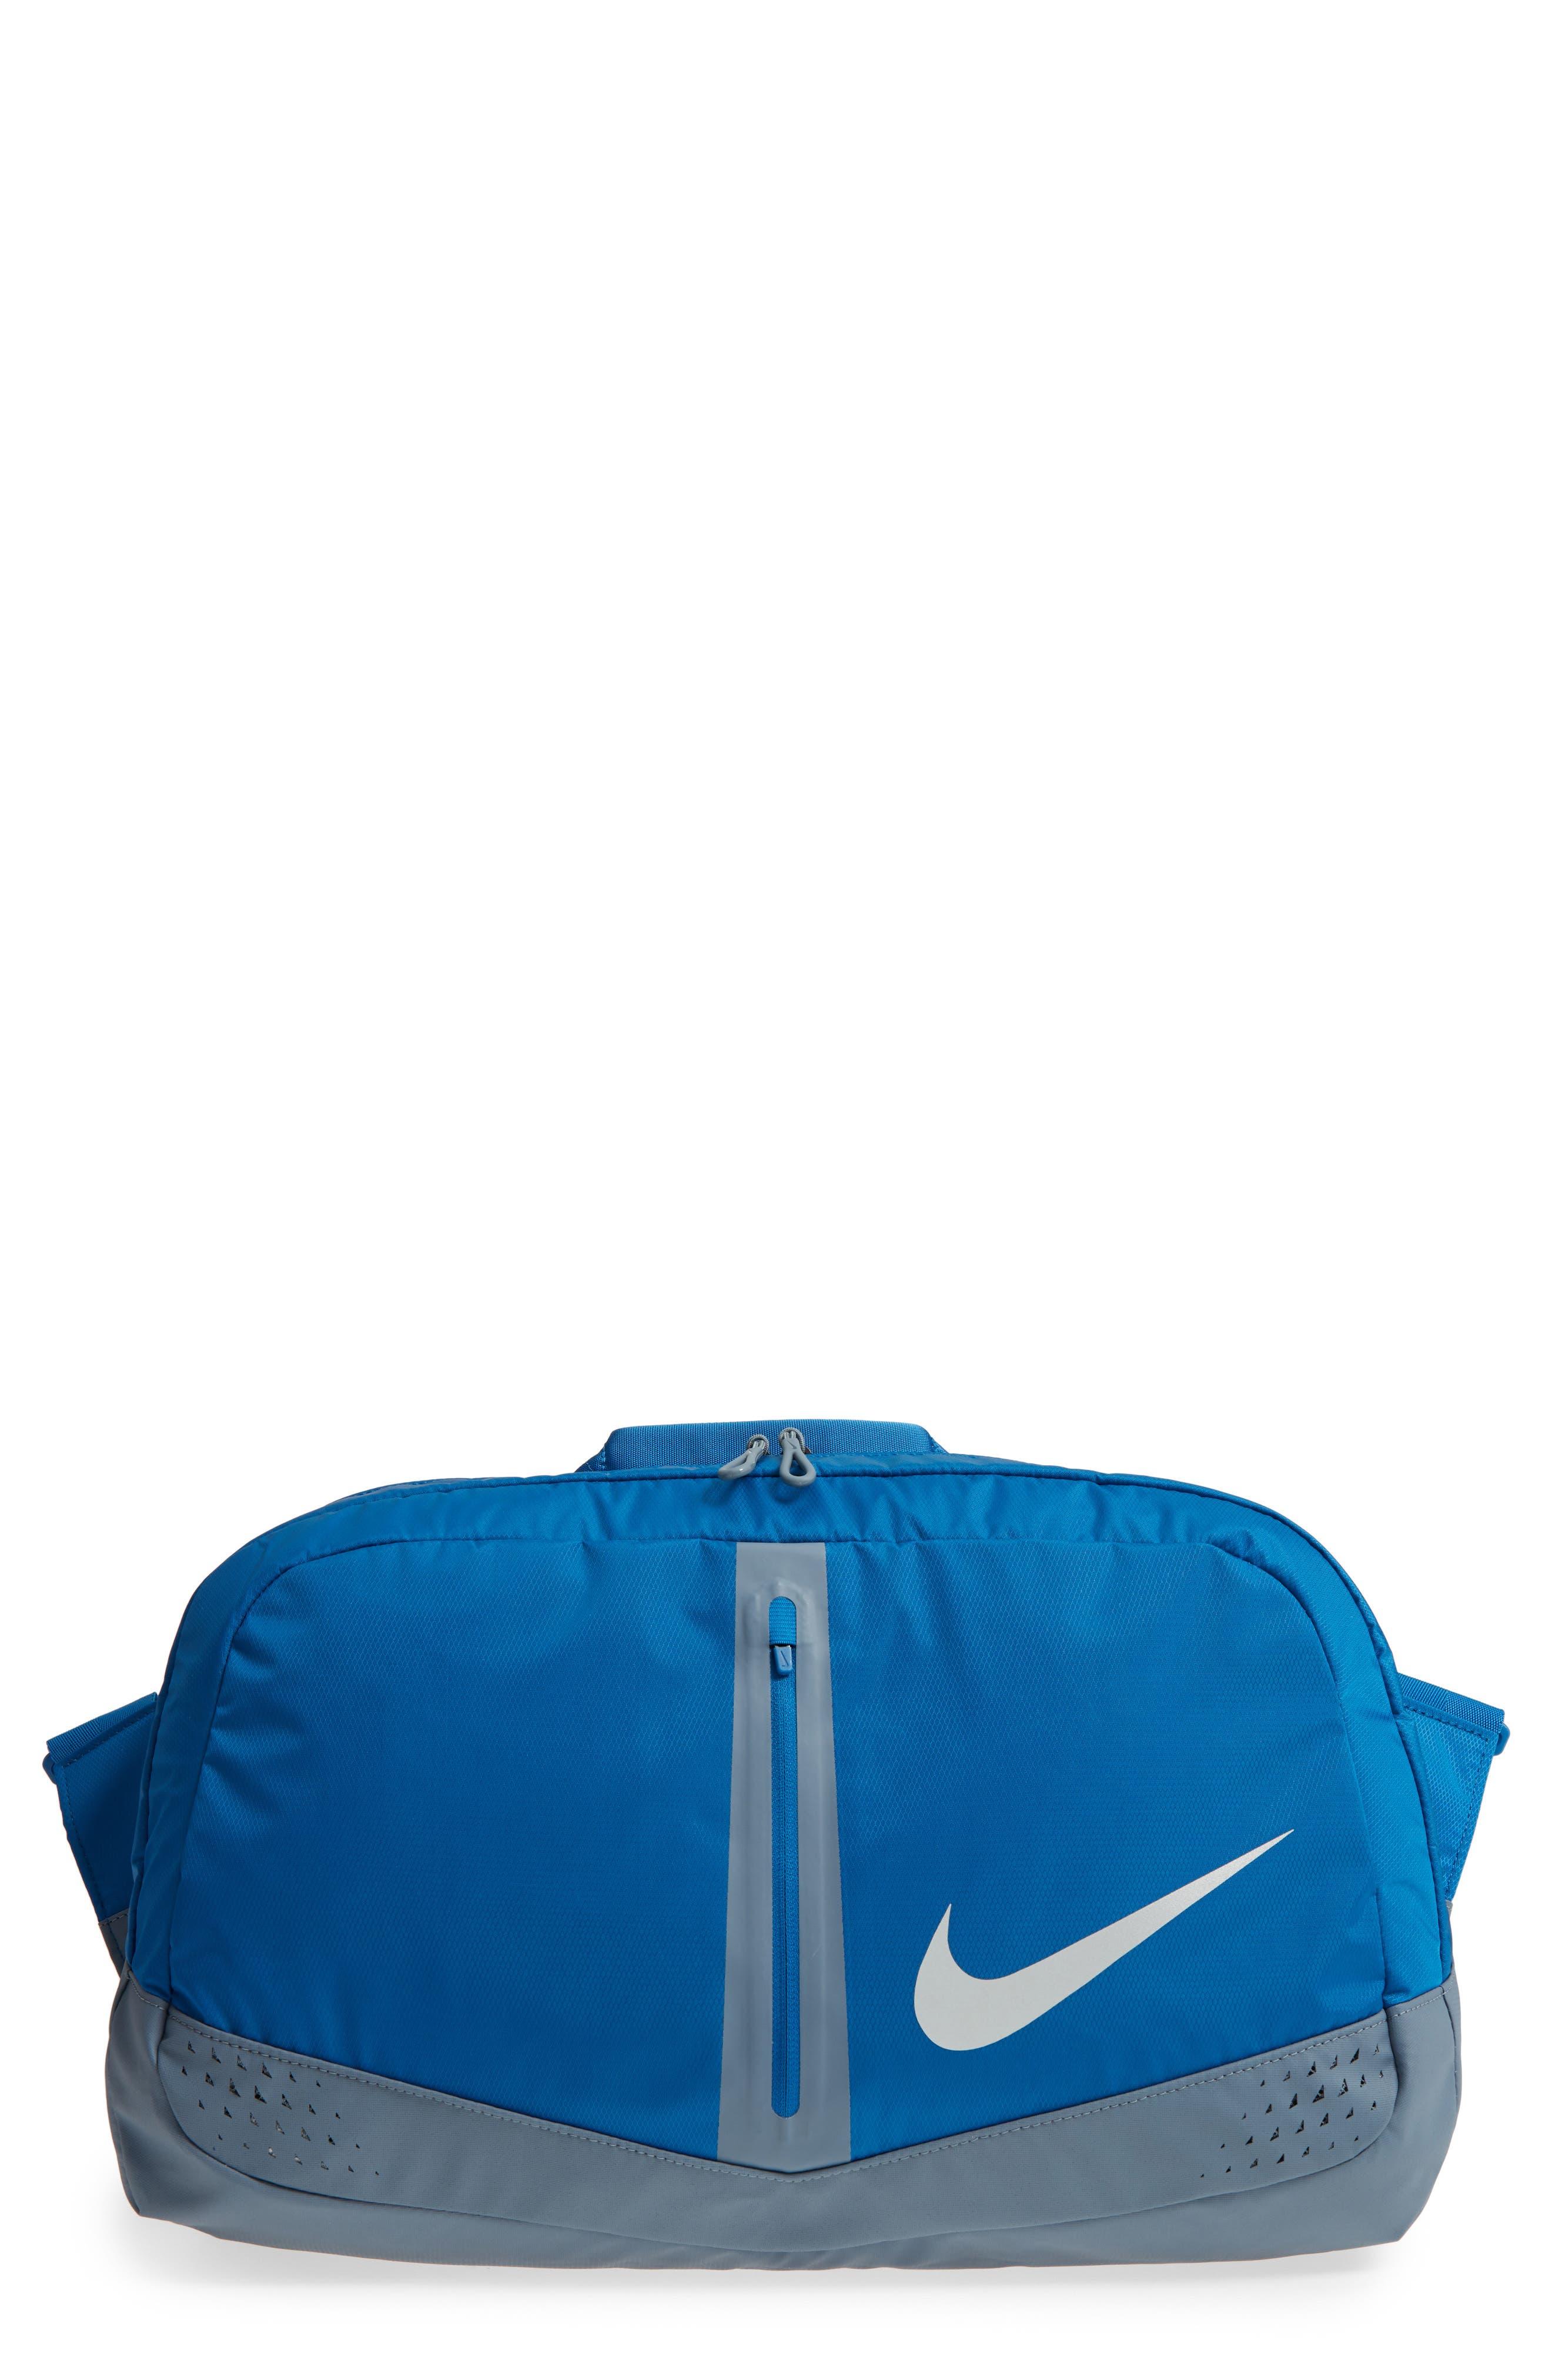 Run Duffel Bag,                             Main thumbnail 1, color,                             Blue Jay/ Armory Blue/ Silver